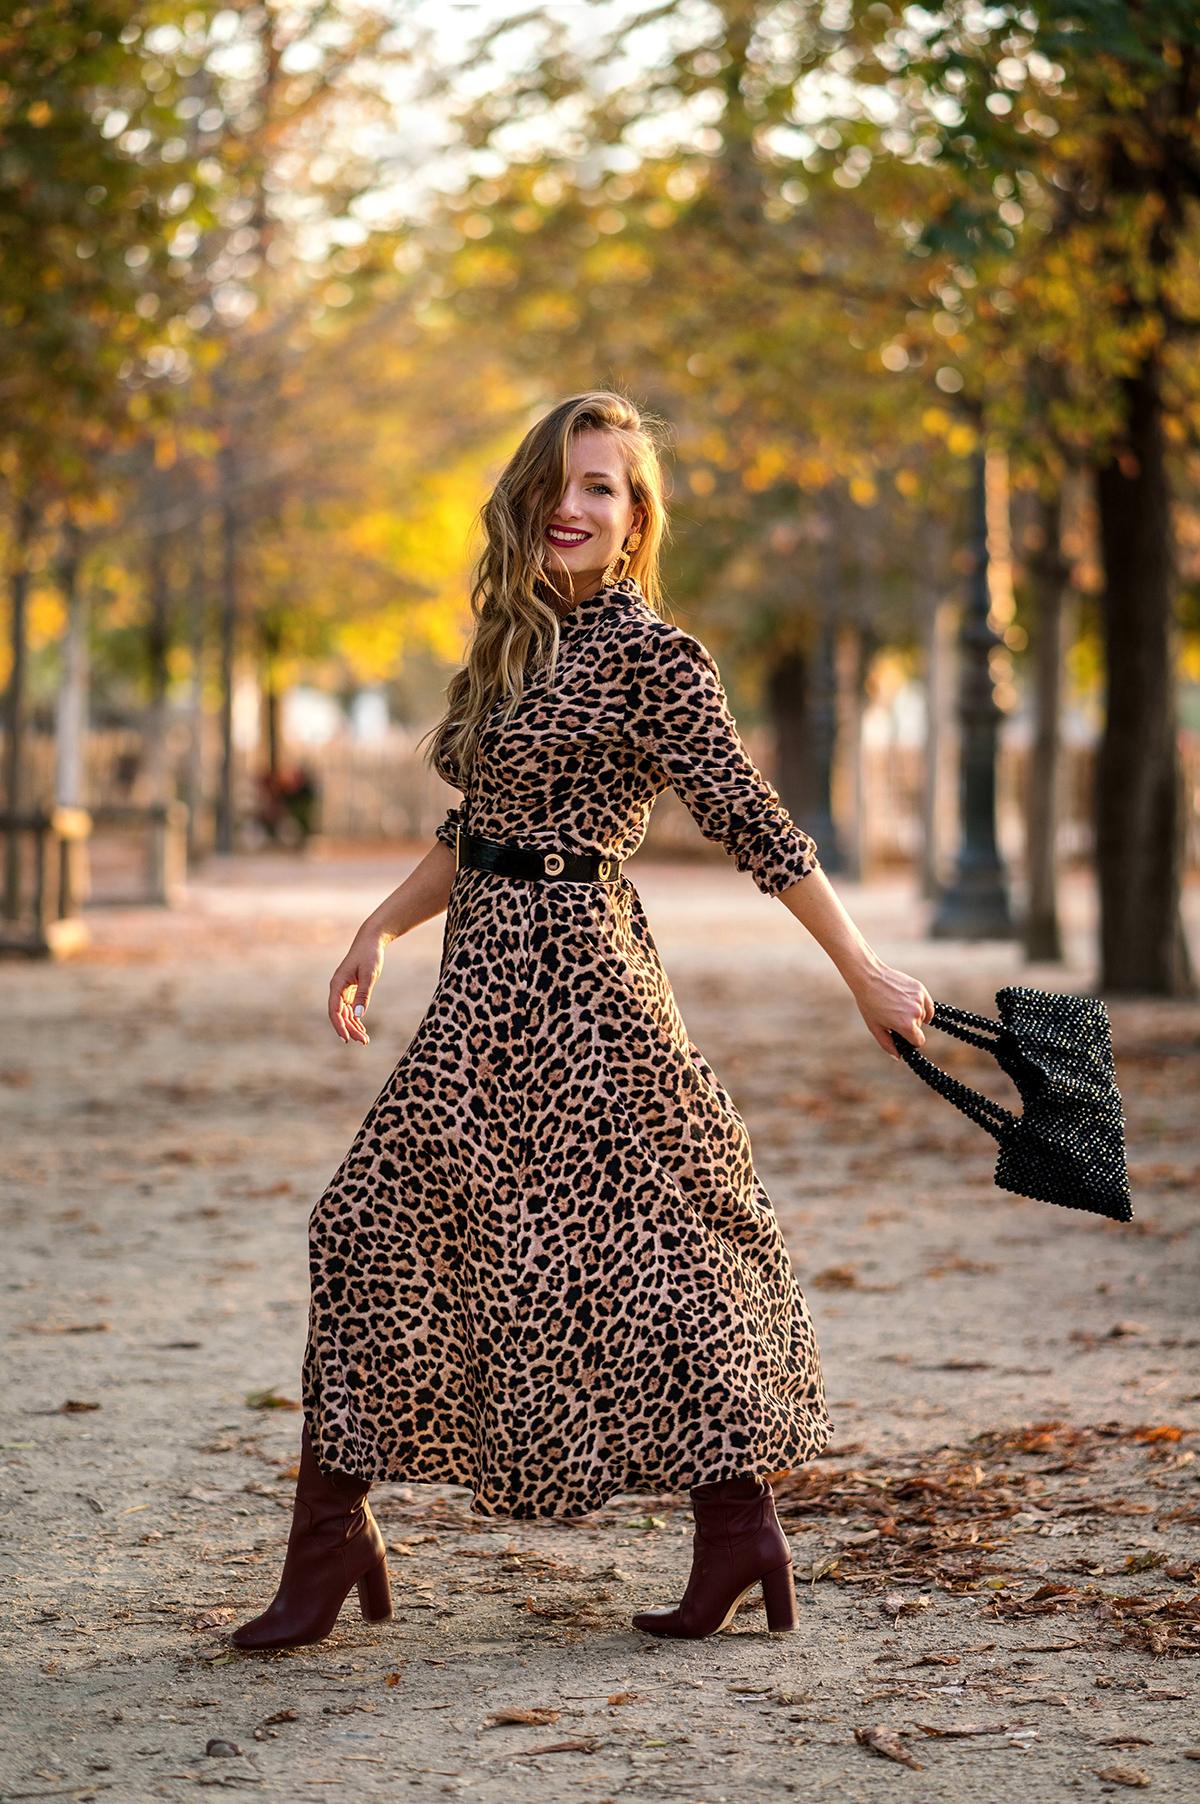 Autumn vibes : robe léopard et bottes bordeaux vintage   My Blog